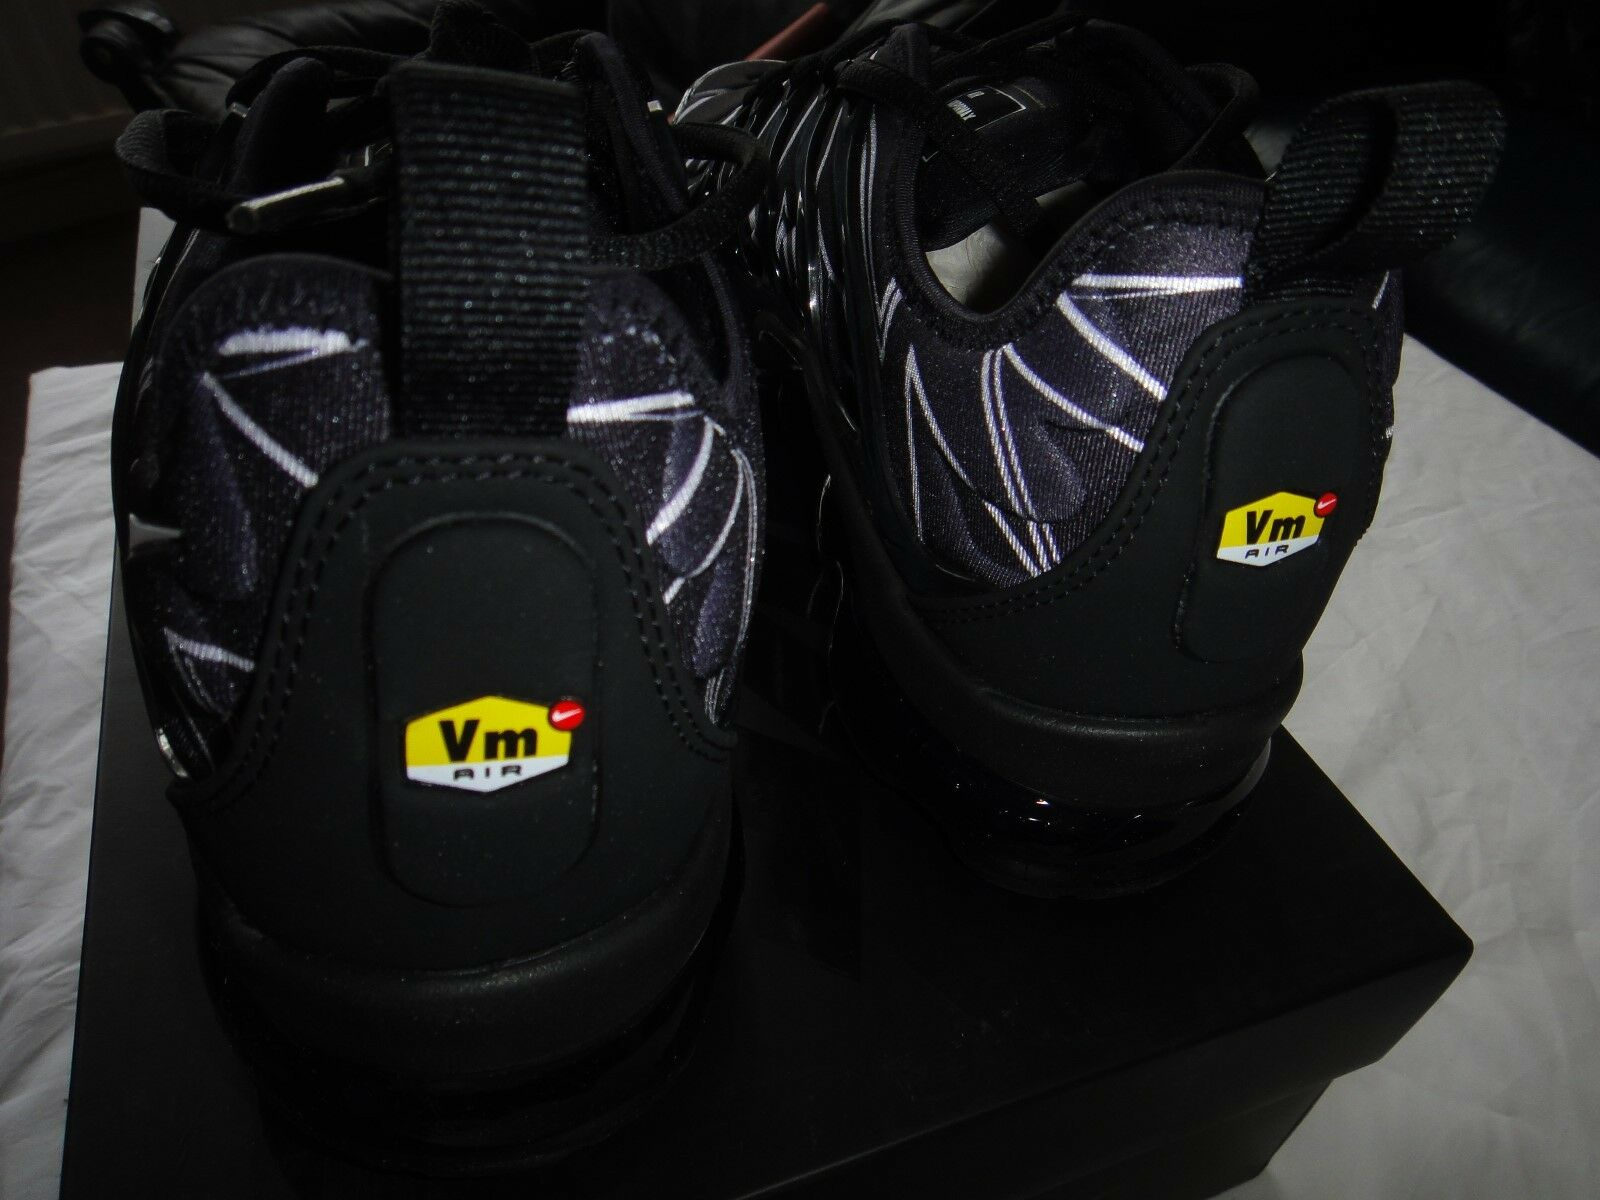 Nike Air VaporMax VaporMax VaporMax Plus HL Zig-Zag AJ6312-001 Bianca Nera Taglia RARO!!! 7076bc